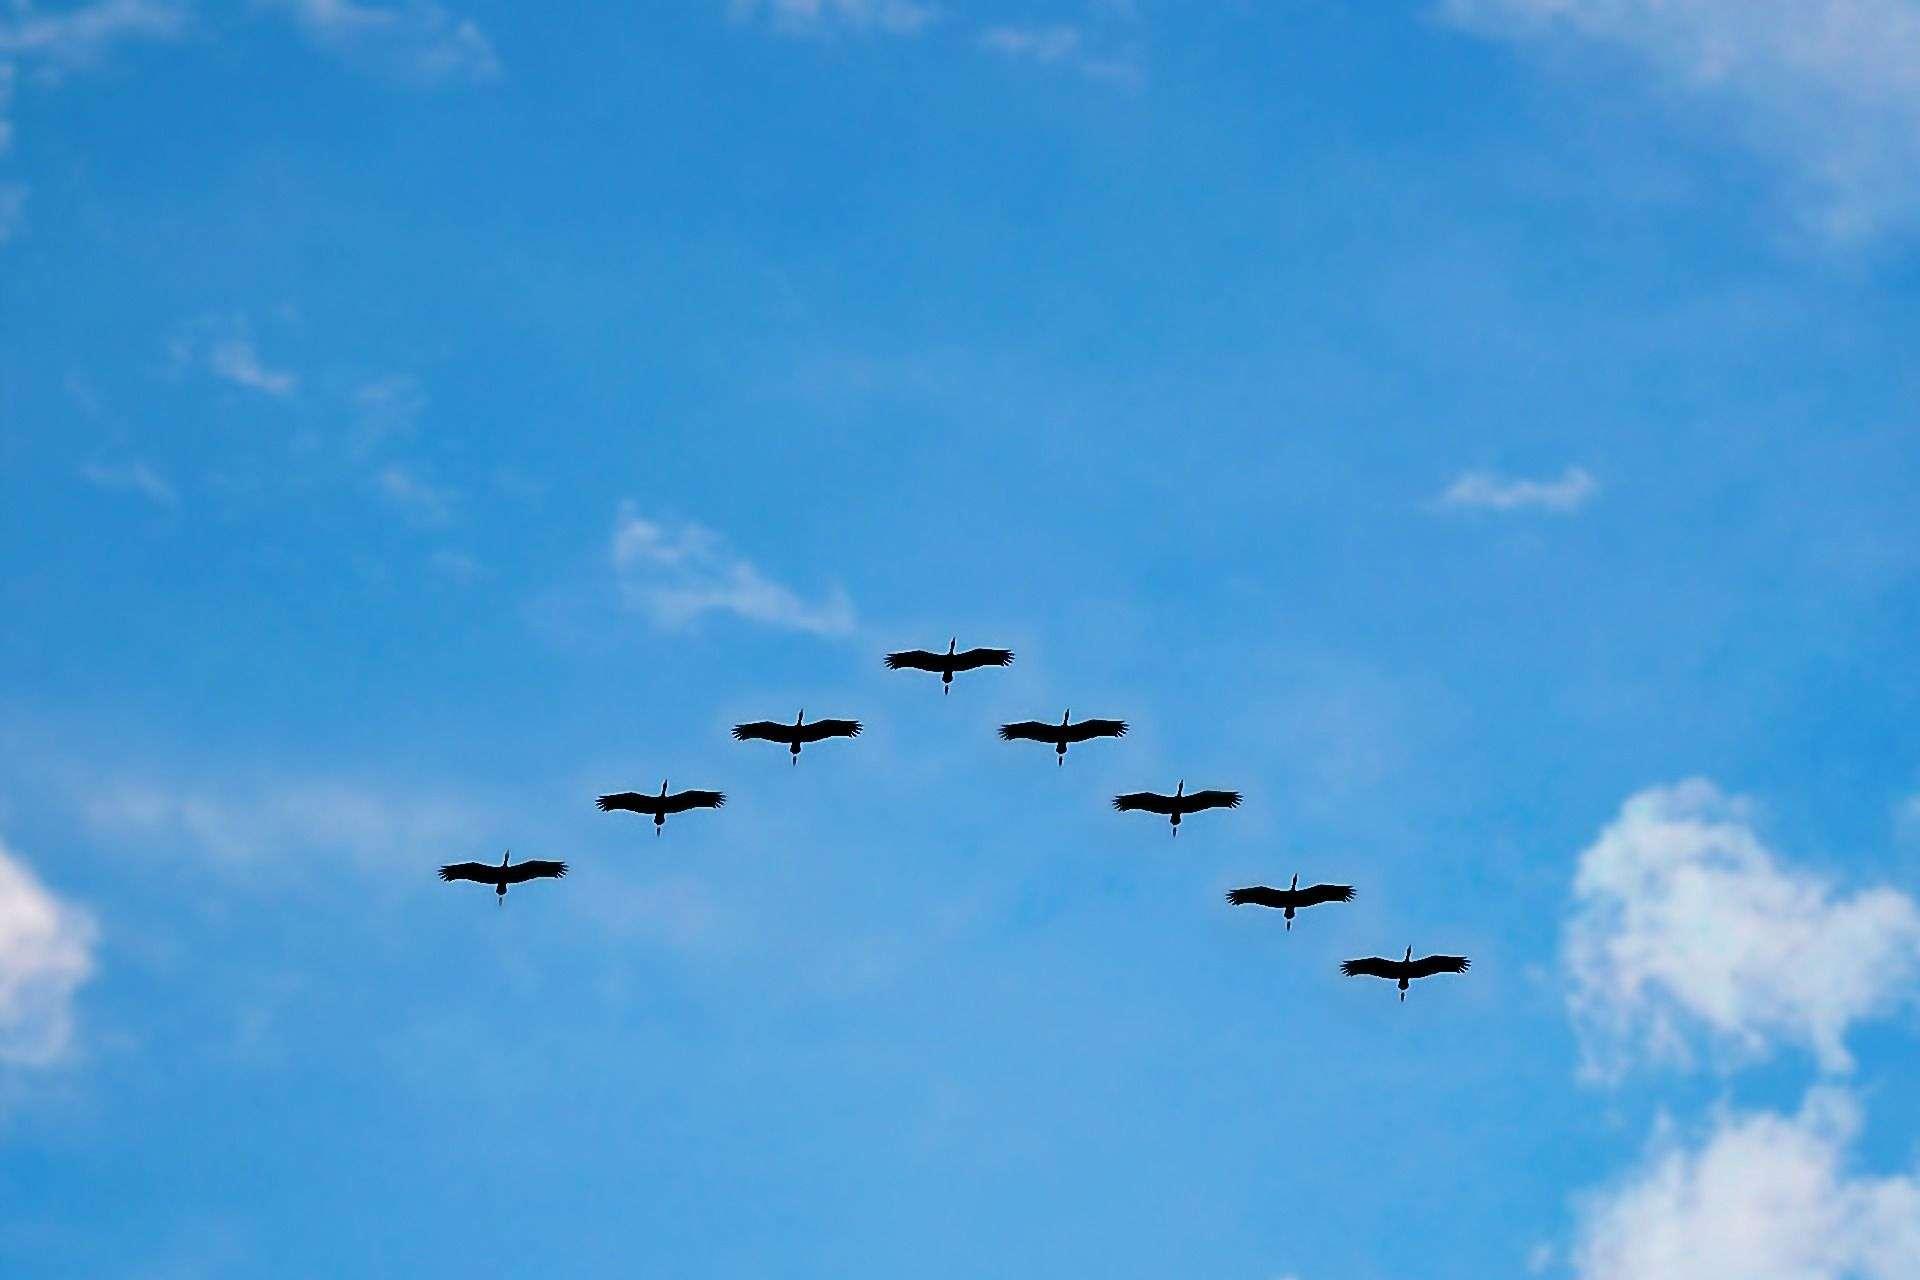 birds-high-fly-flying-migrating-62667.jpeg